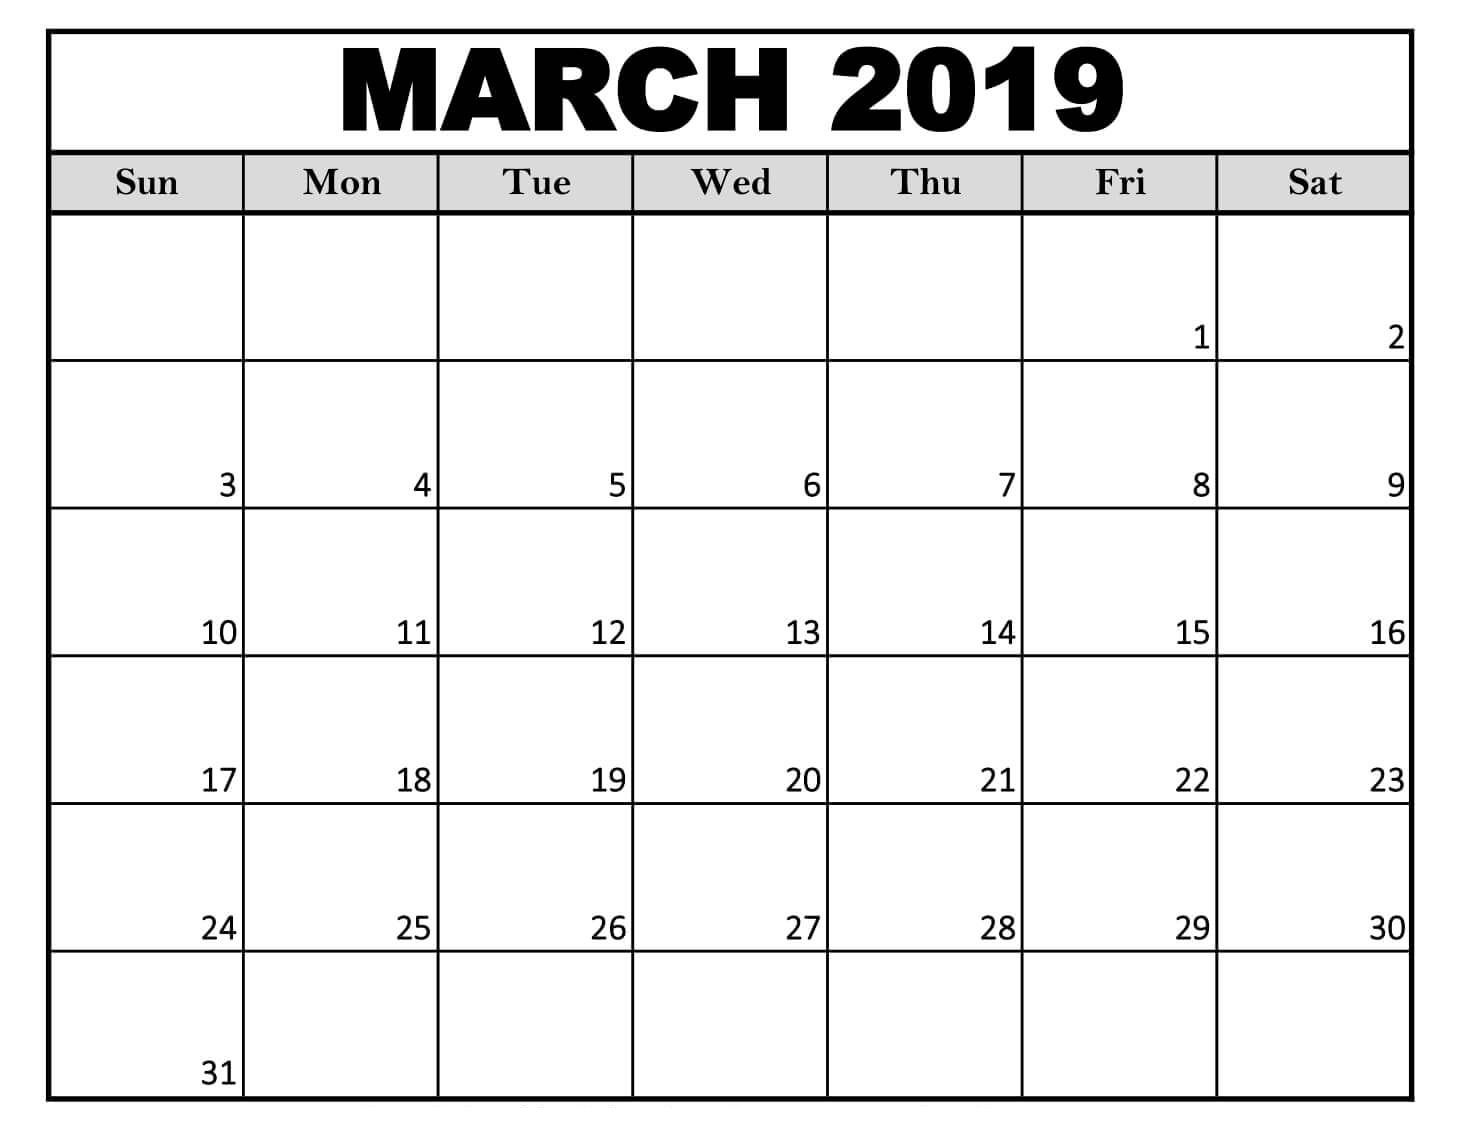 Edit Calendar 2019 edit march 2019 calendar template | 2019 Calendars | 2019 calendar